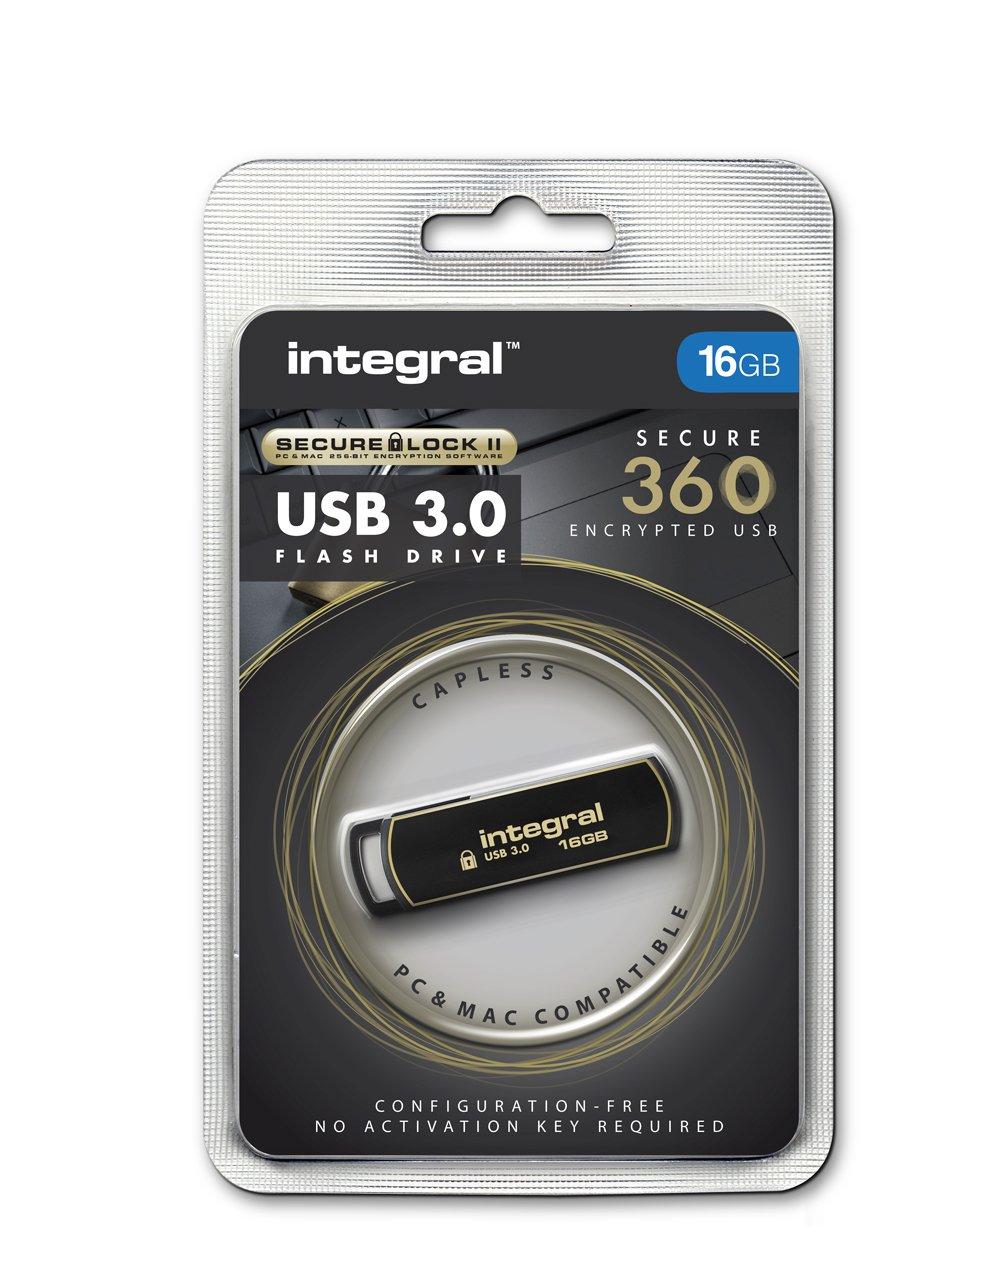 Integral 16gb Secure 360 Encrypted Usb30 Flash Drive Sandisk Usb Flashdisk Cruzer Blade Cz52 256 Bit Aes Encryption Computers Accessories